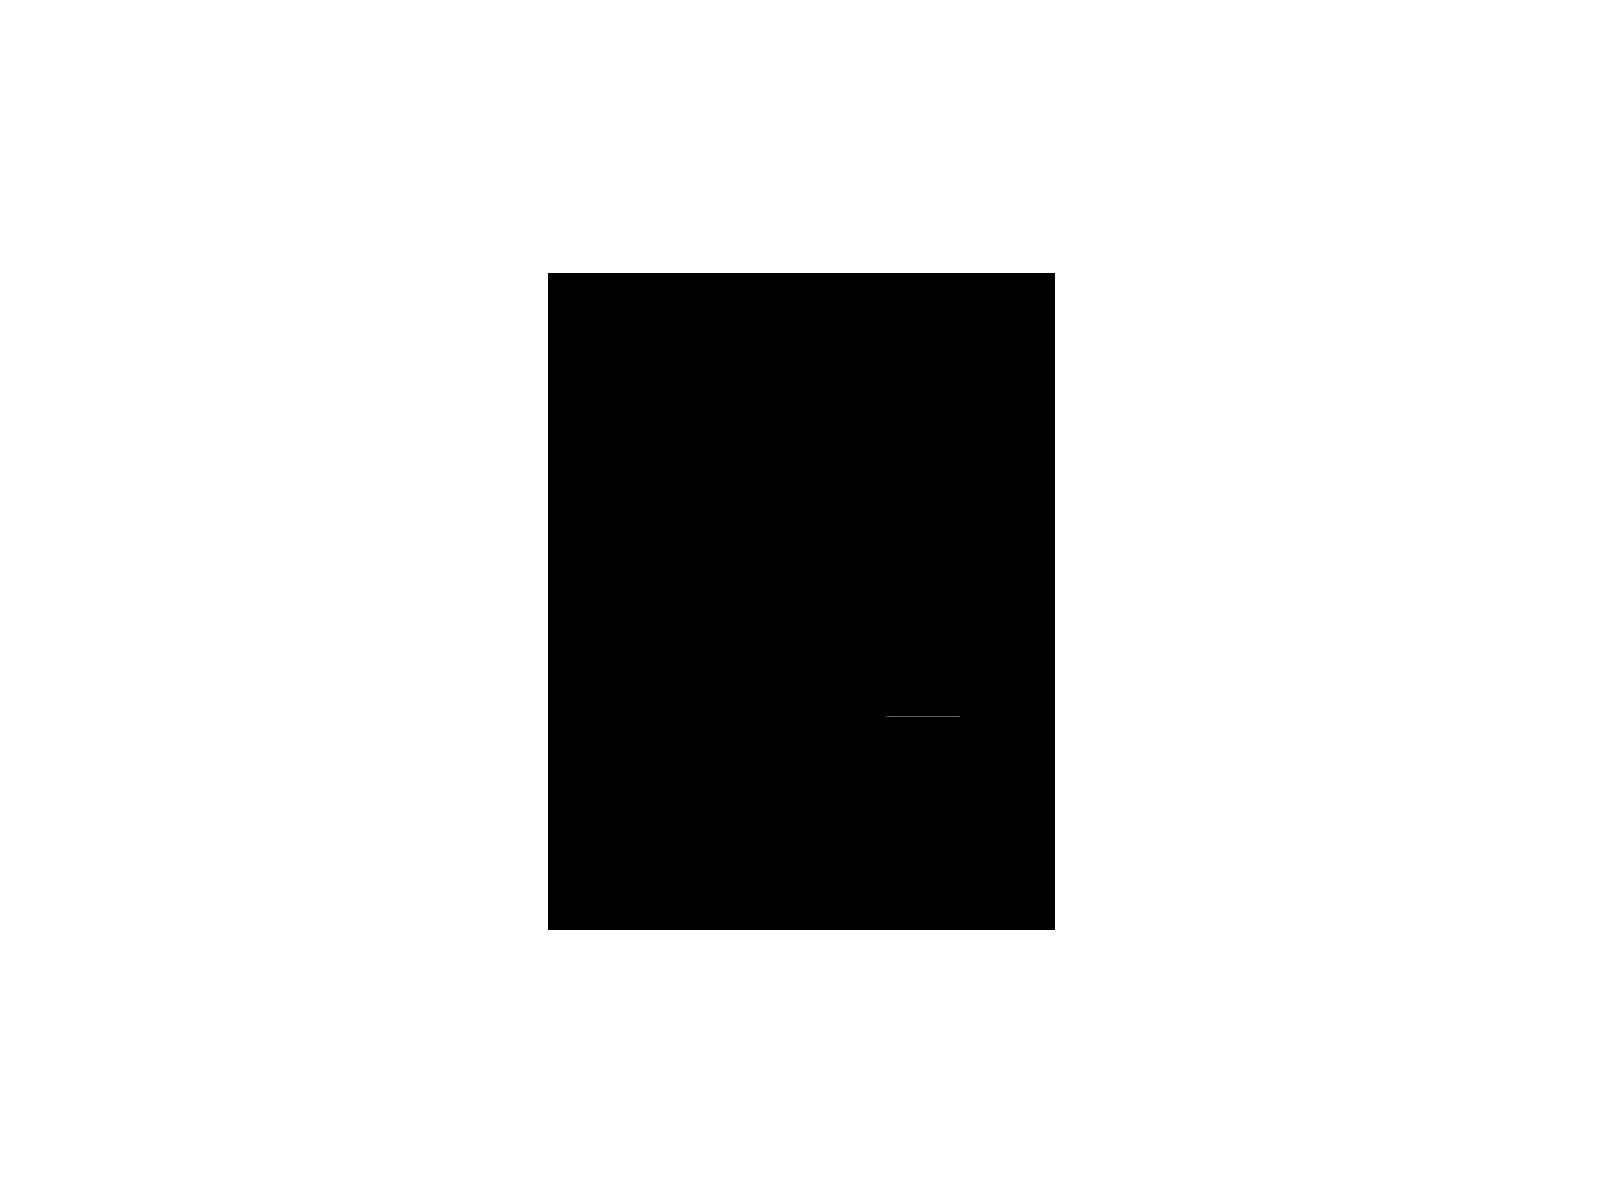 AE 03